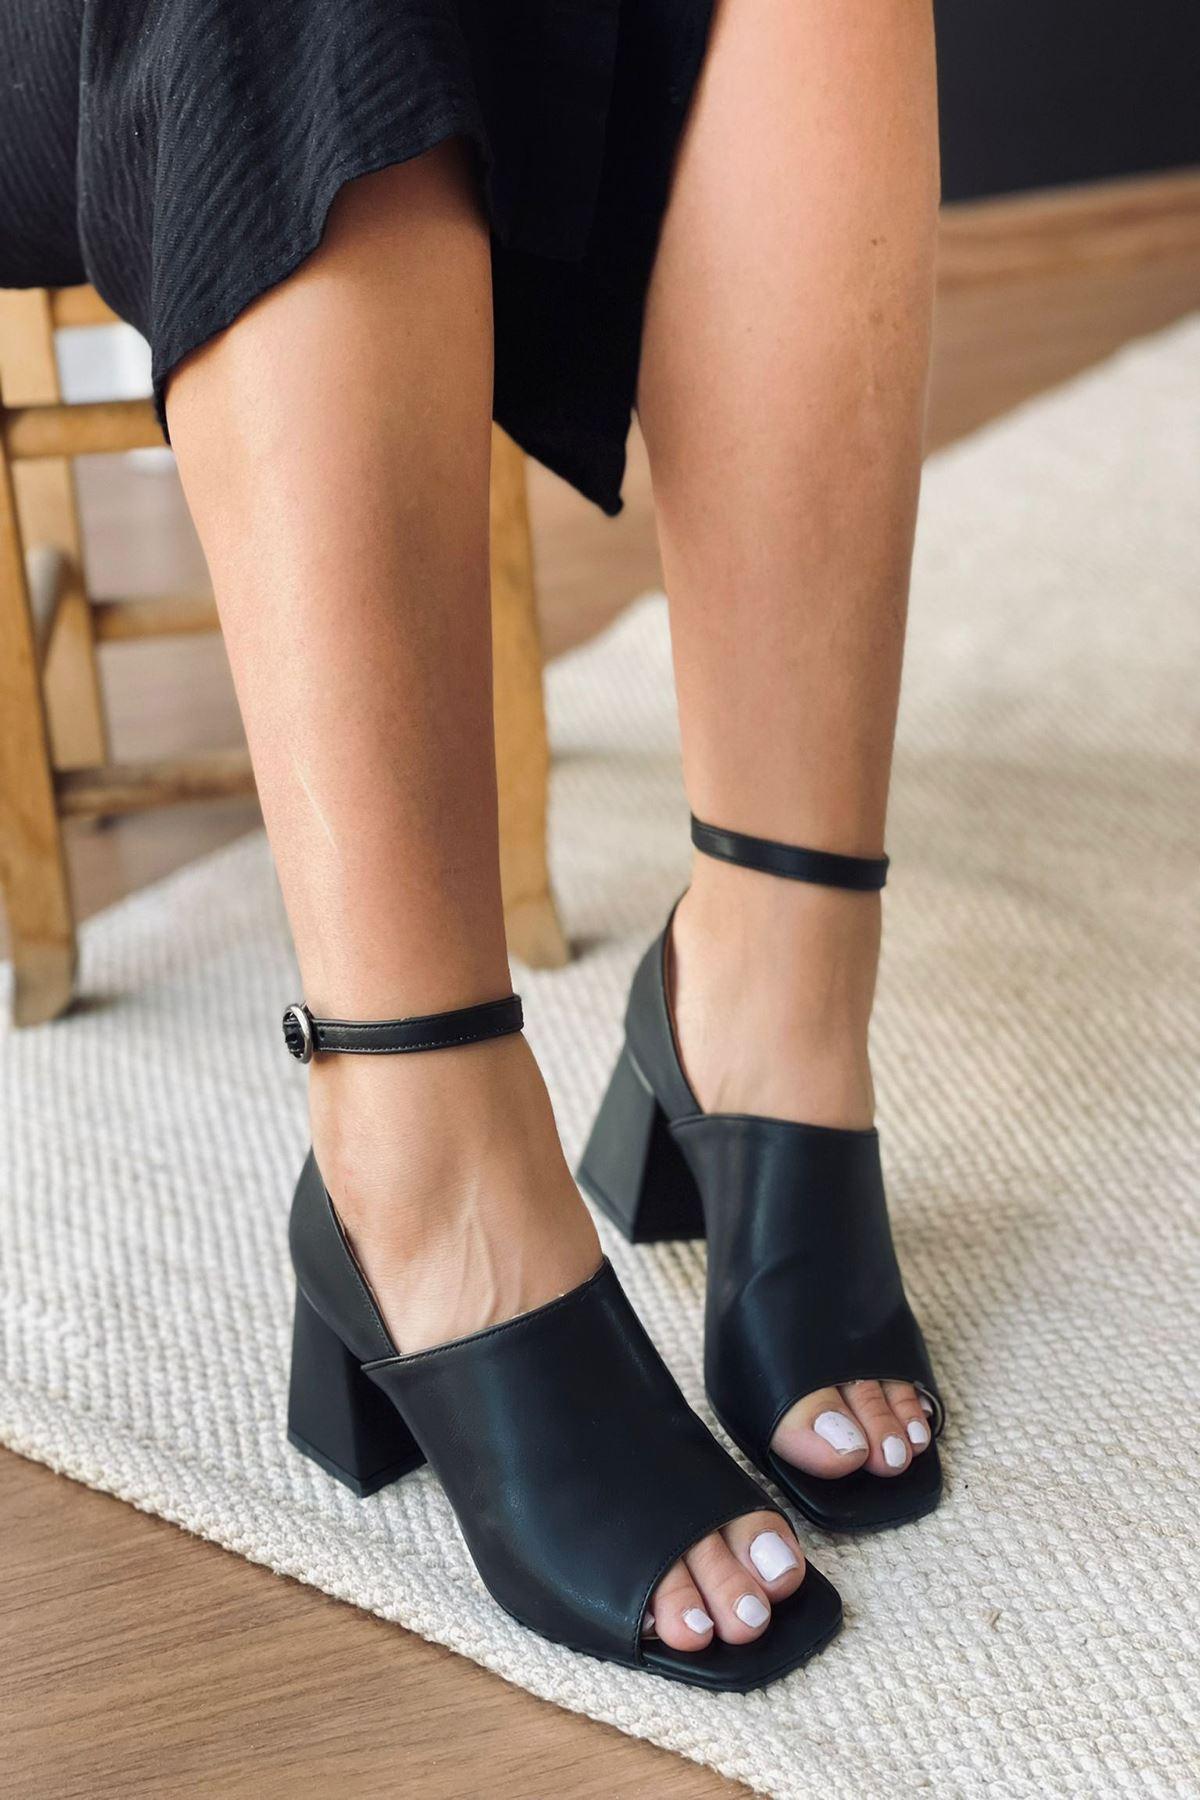 Y706 Siyah Deri Topuklu Ayakkabı